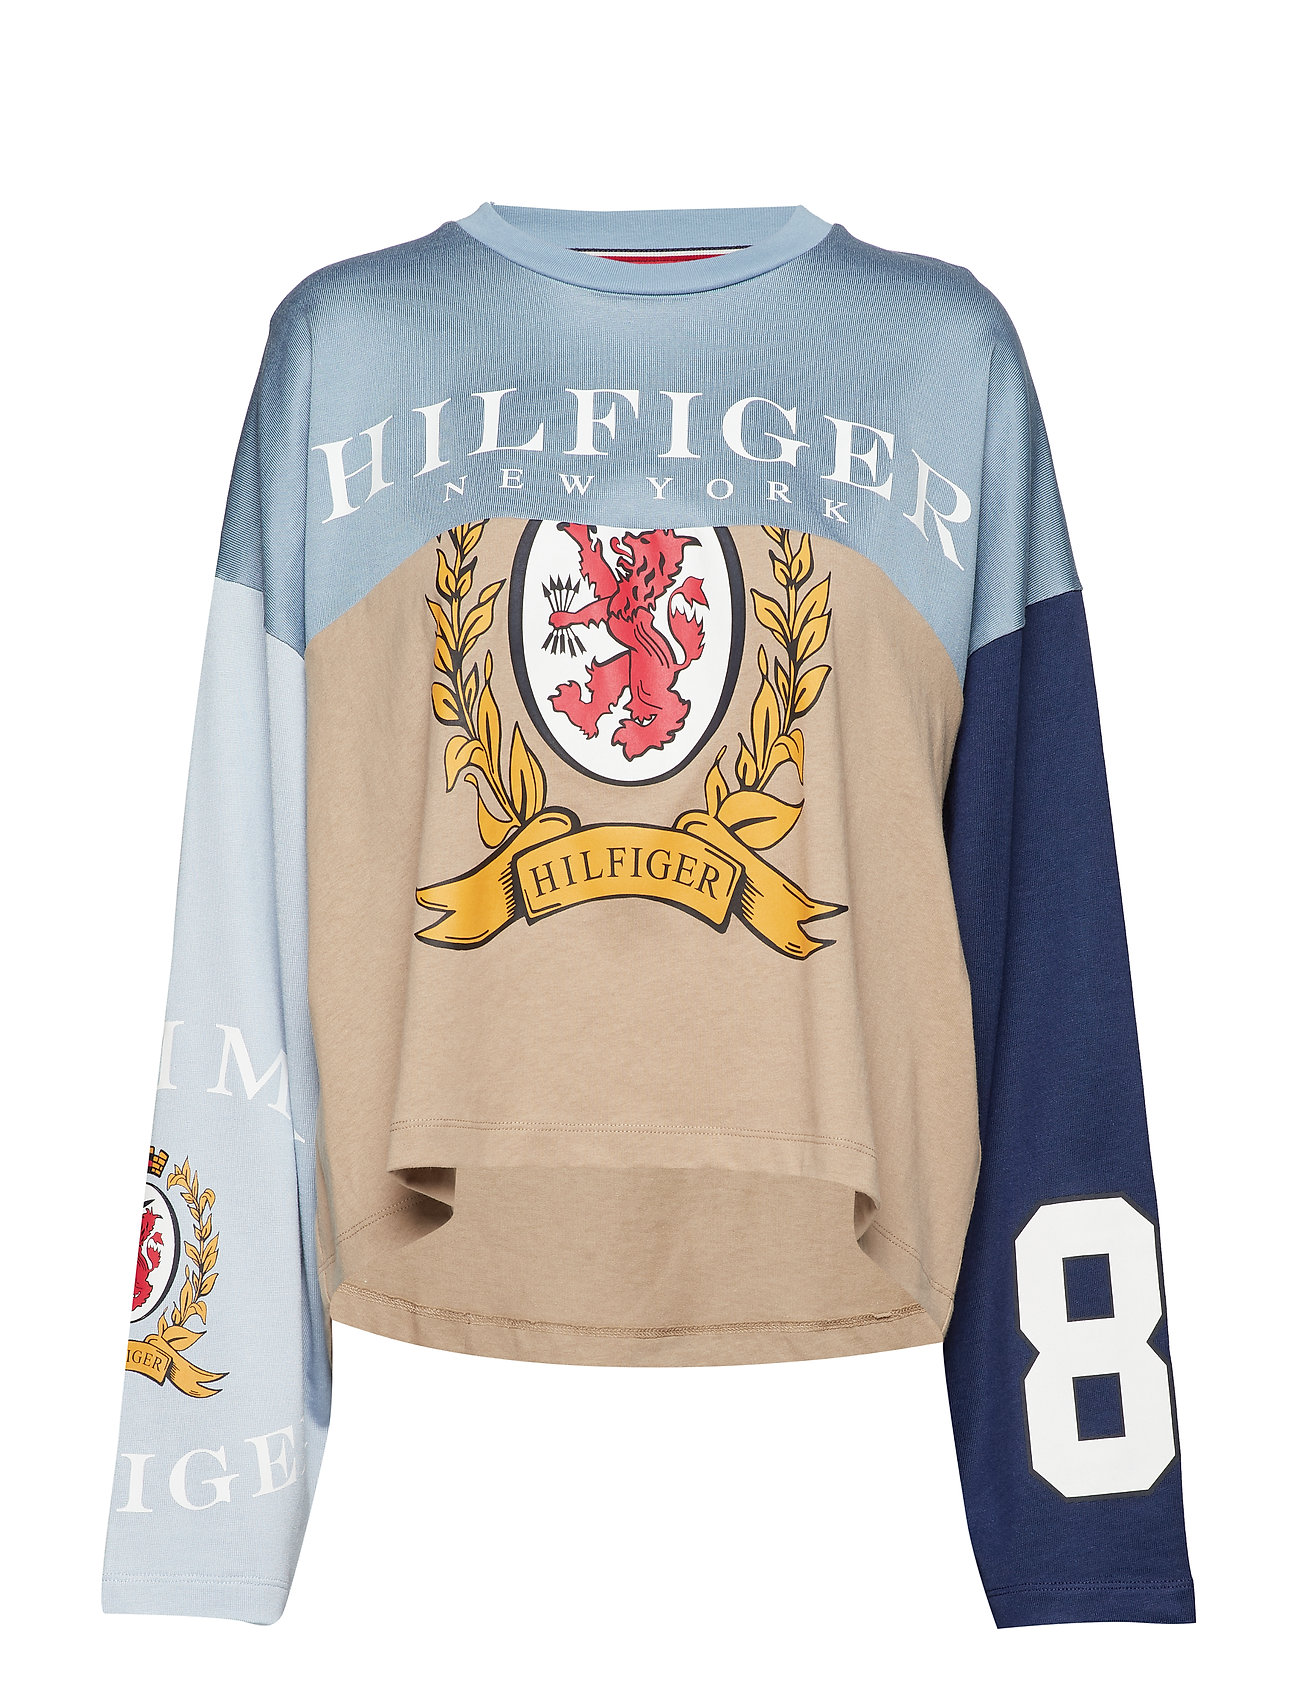 Hilfiger Collection SPLICED FOOTBALL TSH - CROISSANT / MULTI